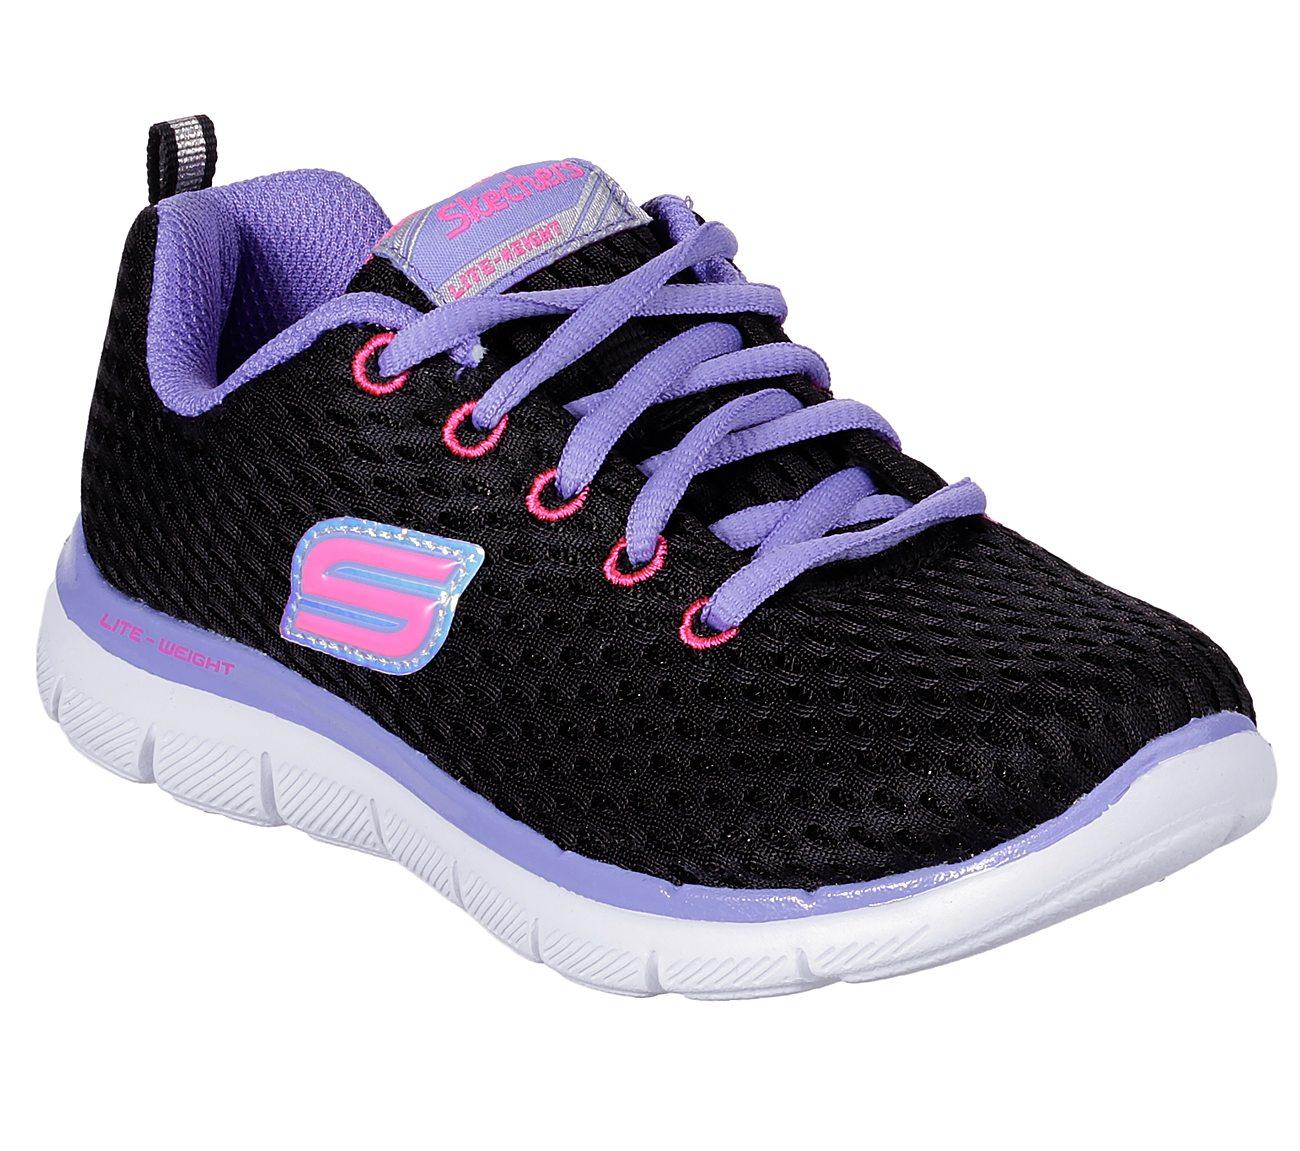 cbe7568ad7 Buy SKECHERS Skech Appeal 2.0 - Fresh N Fun Walking Shoes Shoes only ...